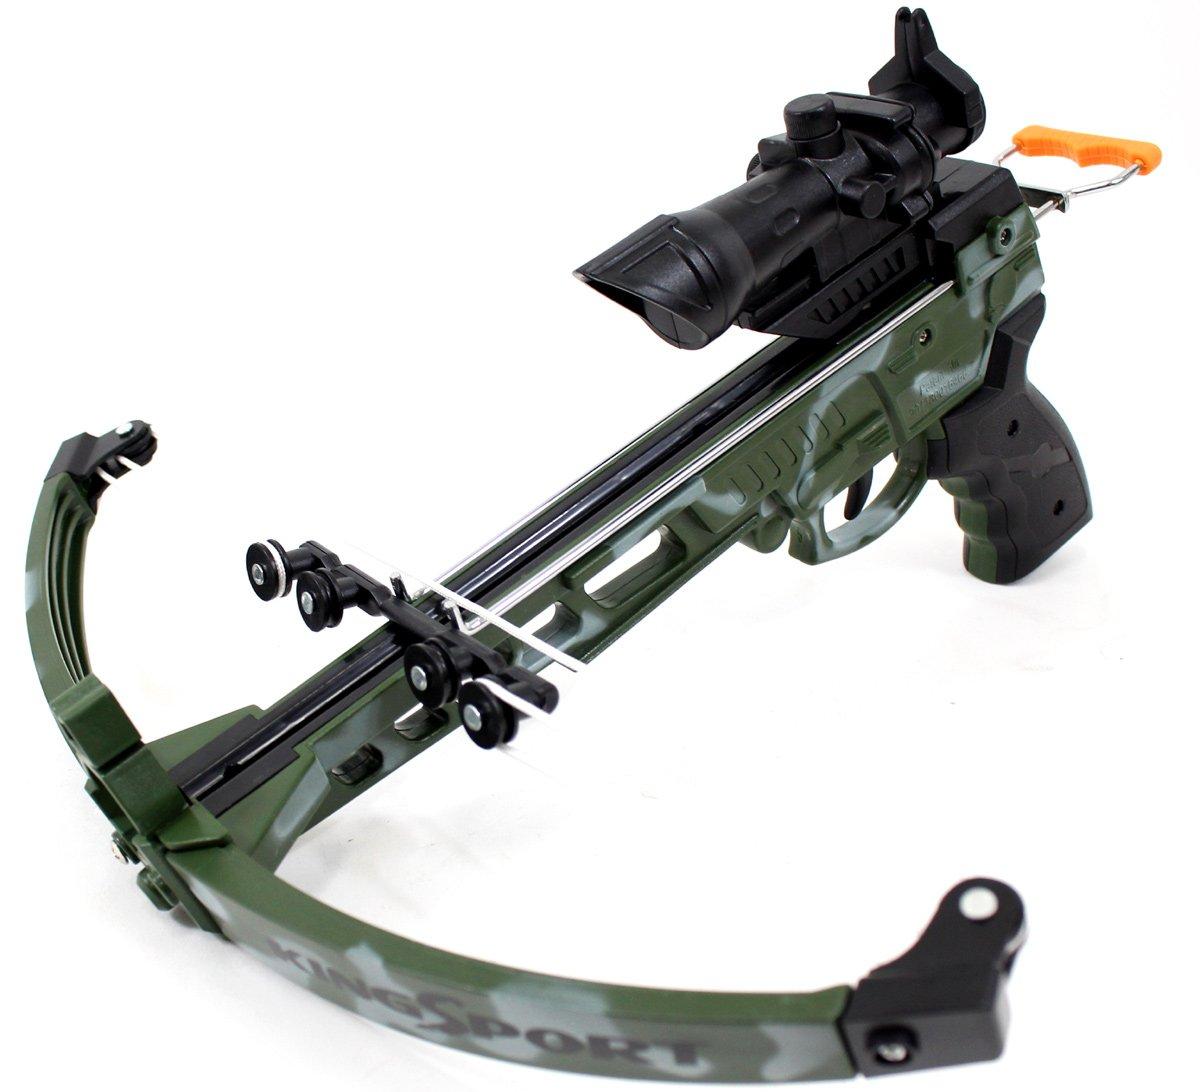 PowerTRC Military Toy Crossbow Set w/Target by PowerTRC (Image #2)